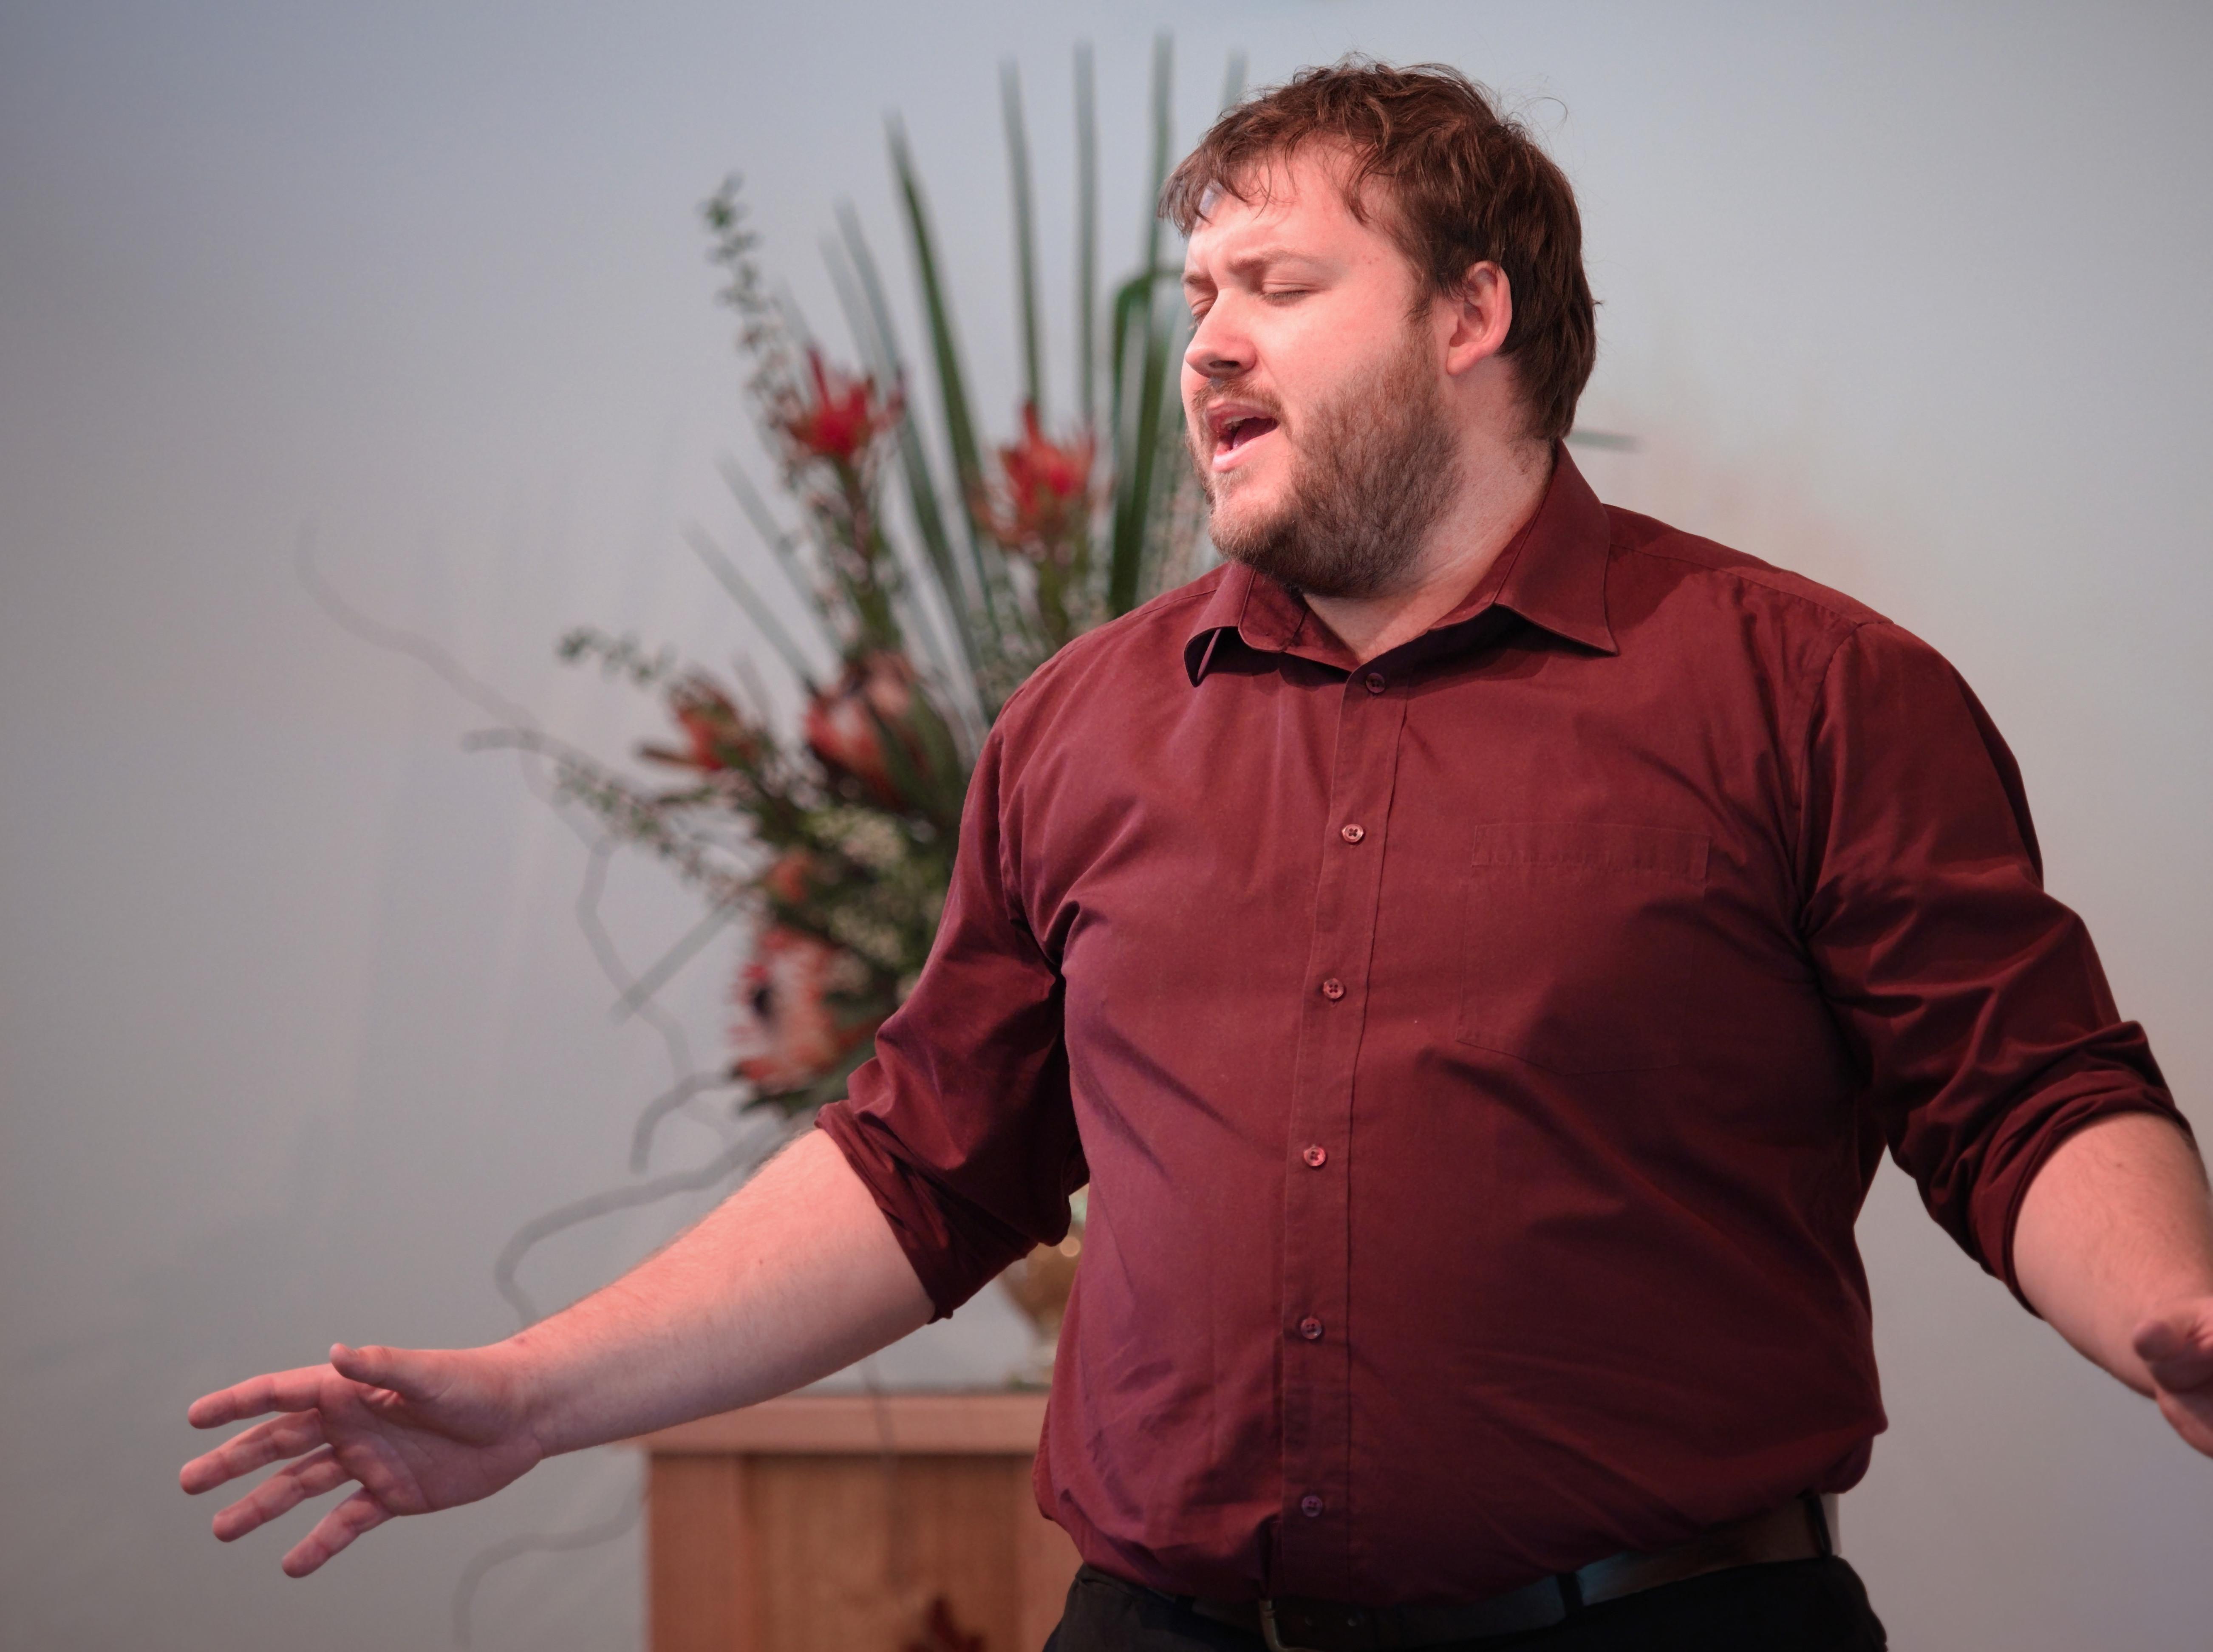 WGE Classical Vocal John Molden Performs